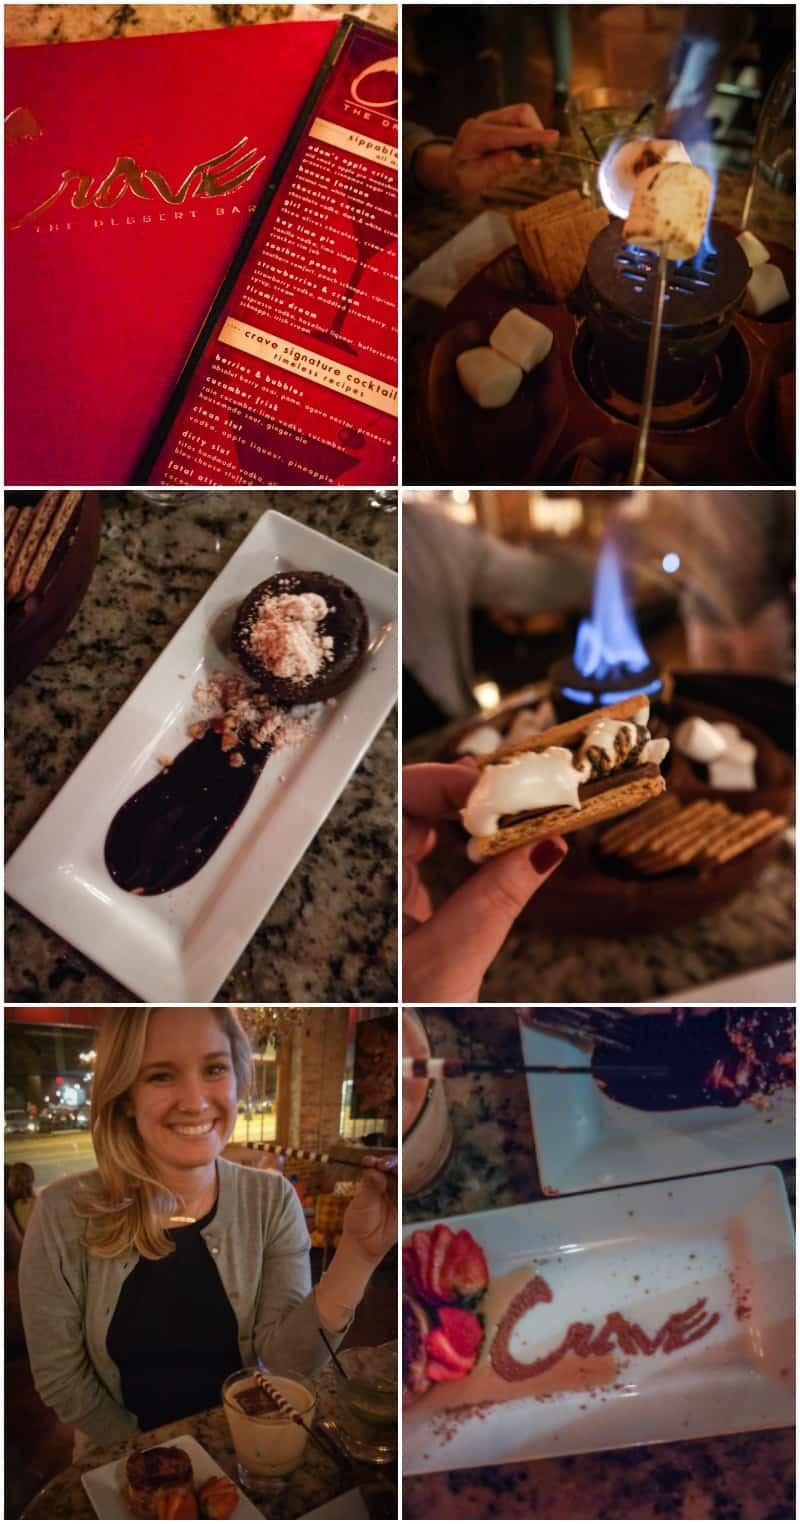 Crave Dessert Bar in Charlotte